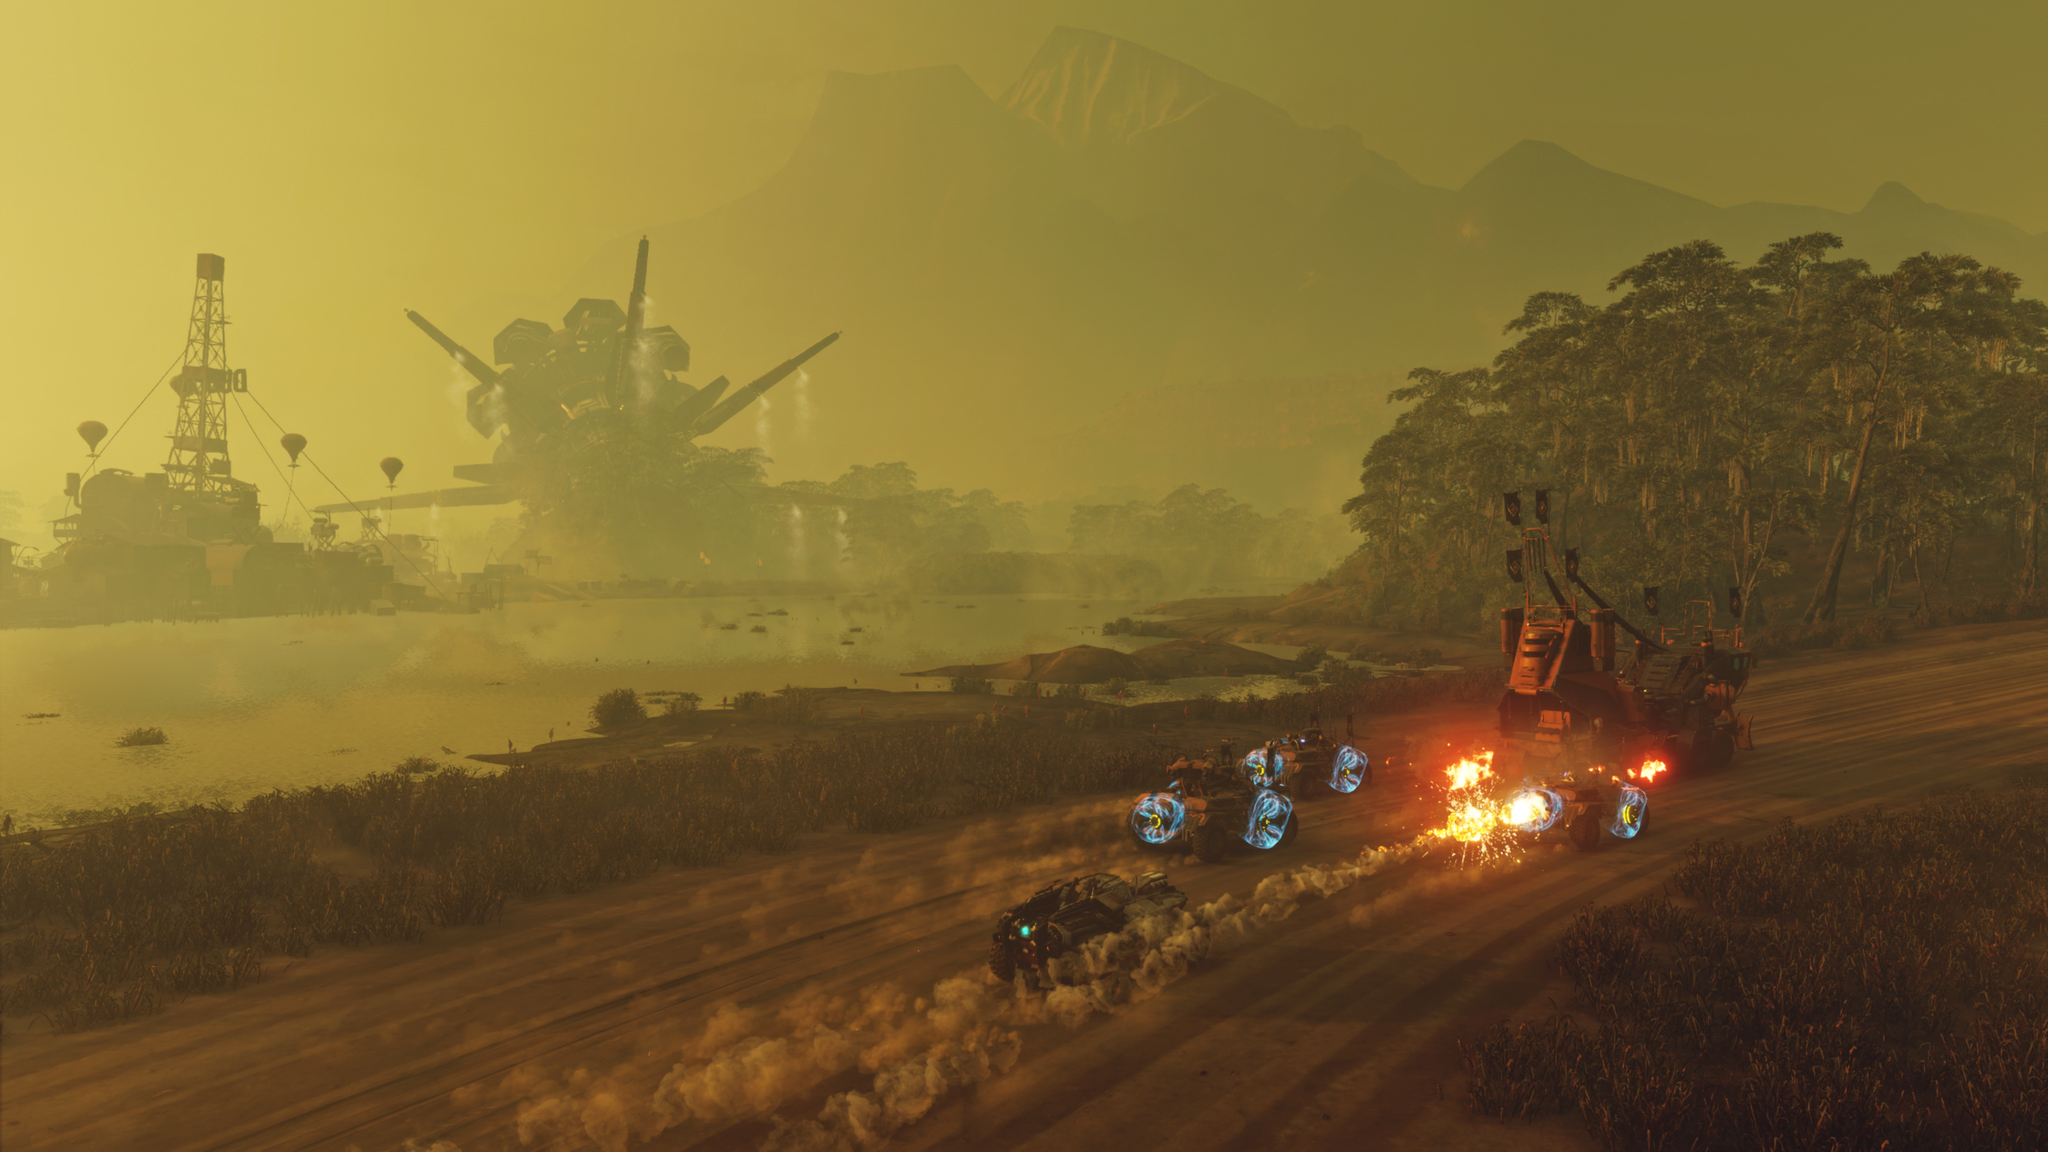 Screenshot Aperçu Rage 2 - Une attaque de convoi